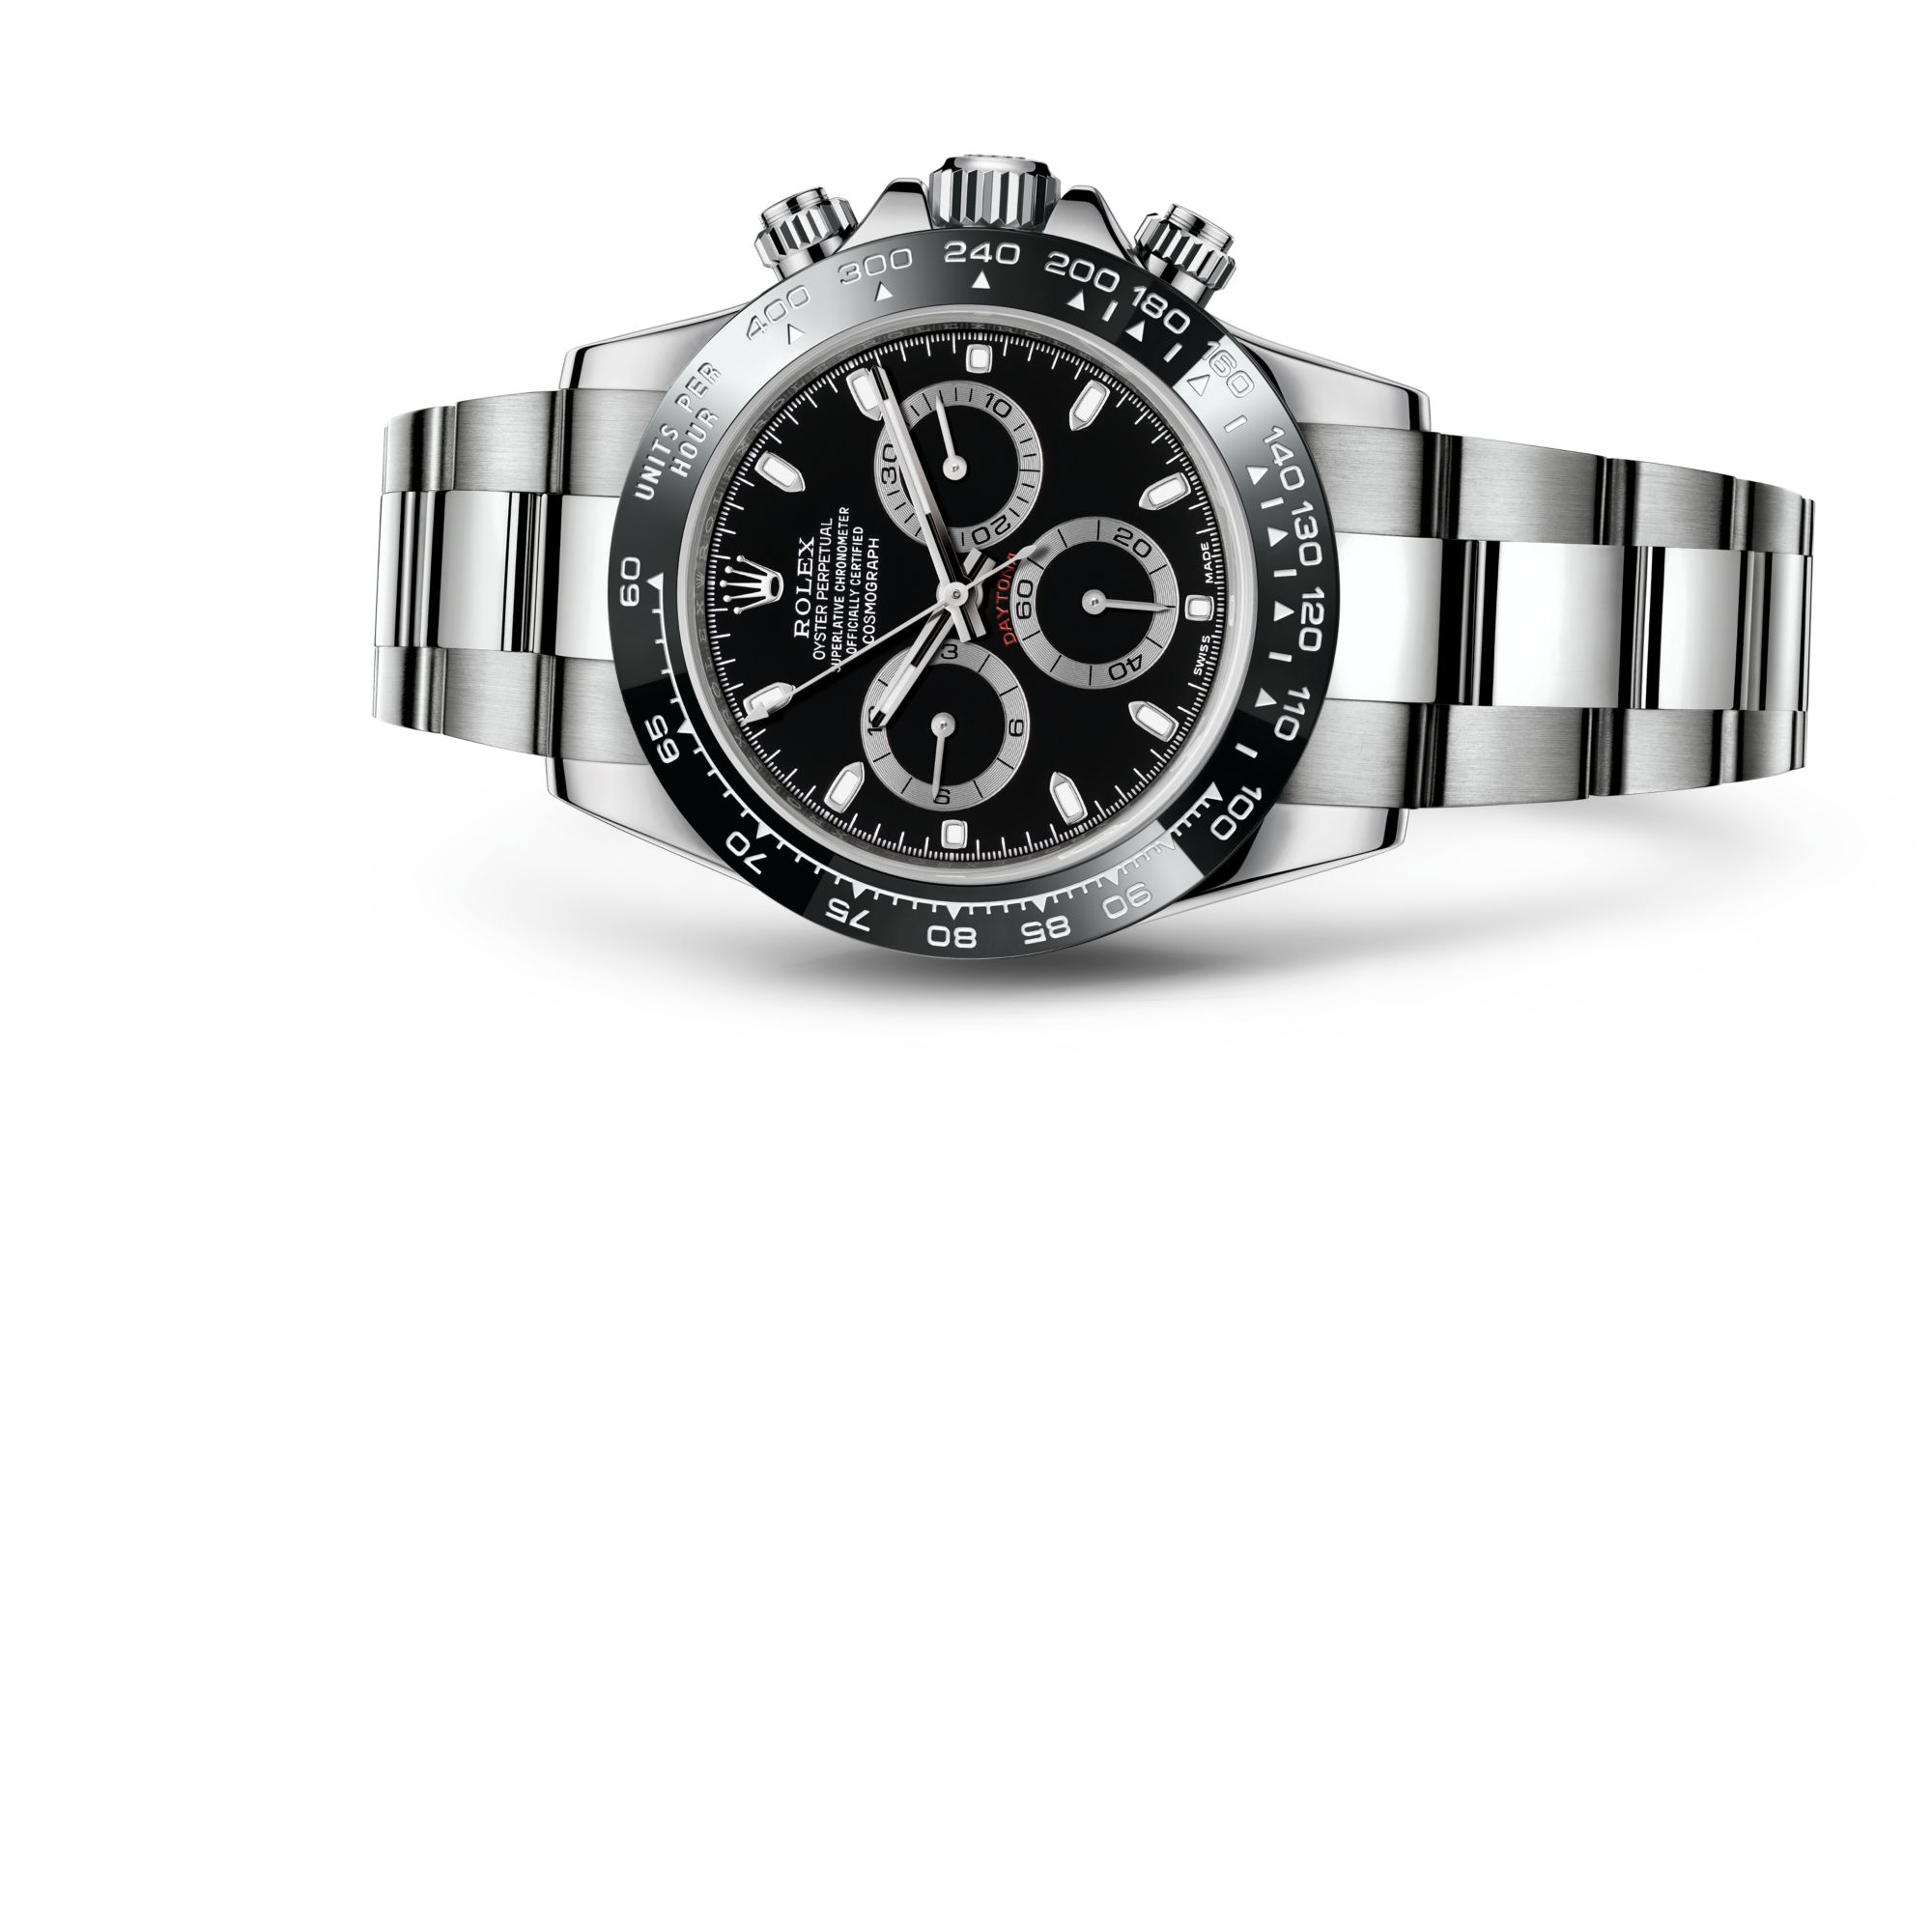 Rolex كوزموغراف دايتونا M116500LN-0002